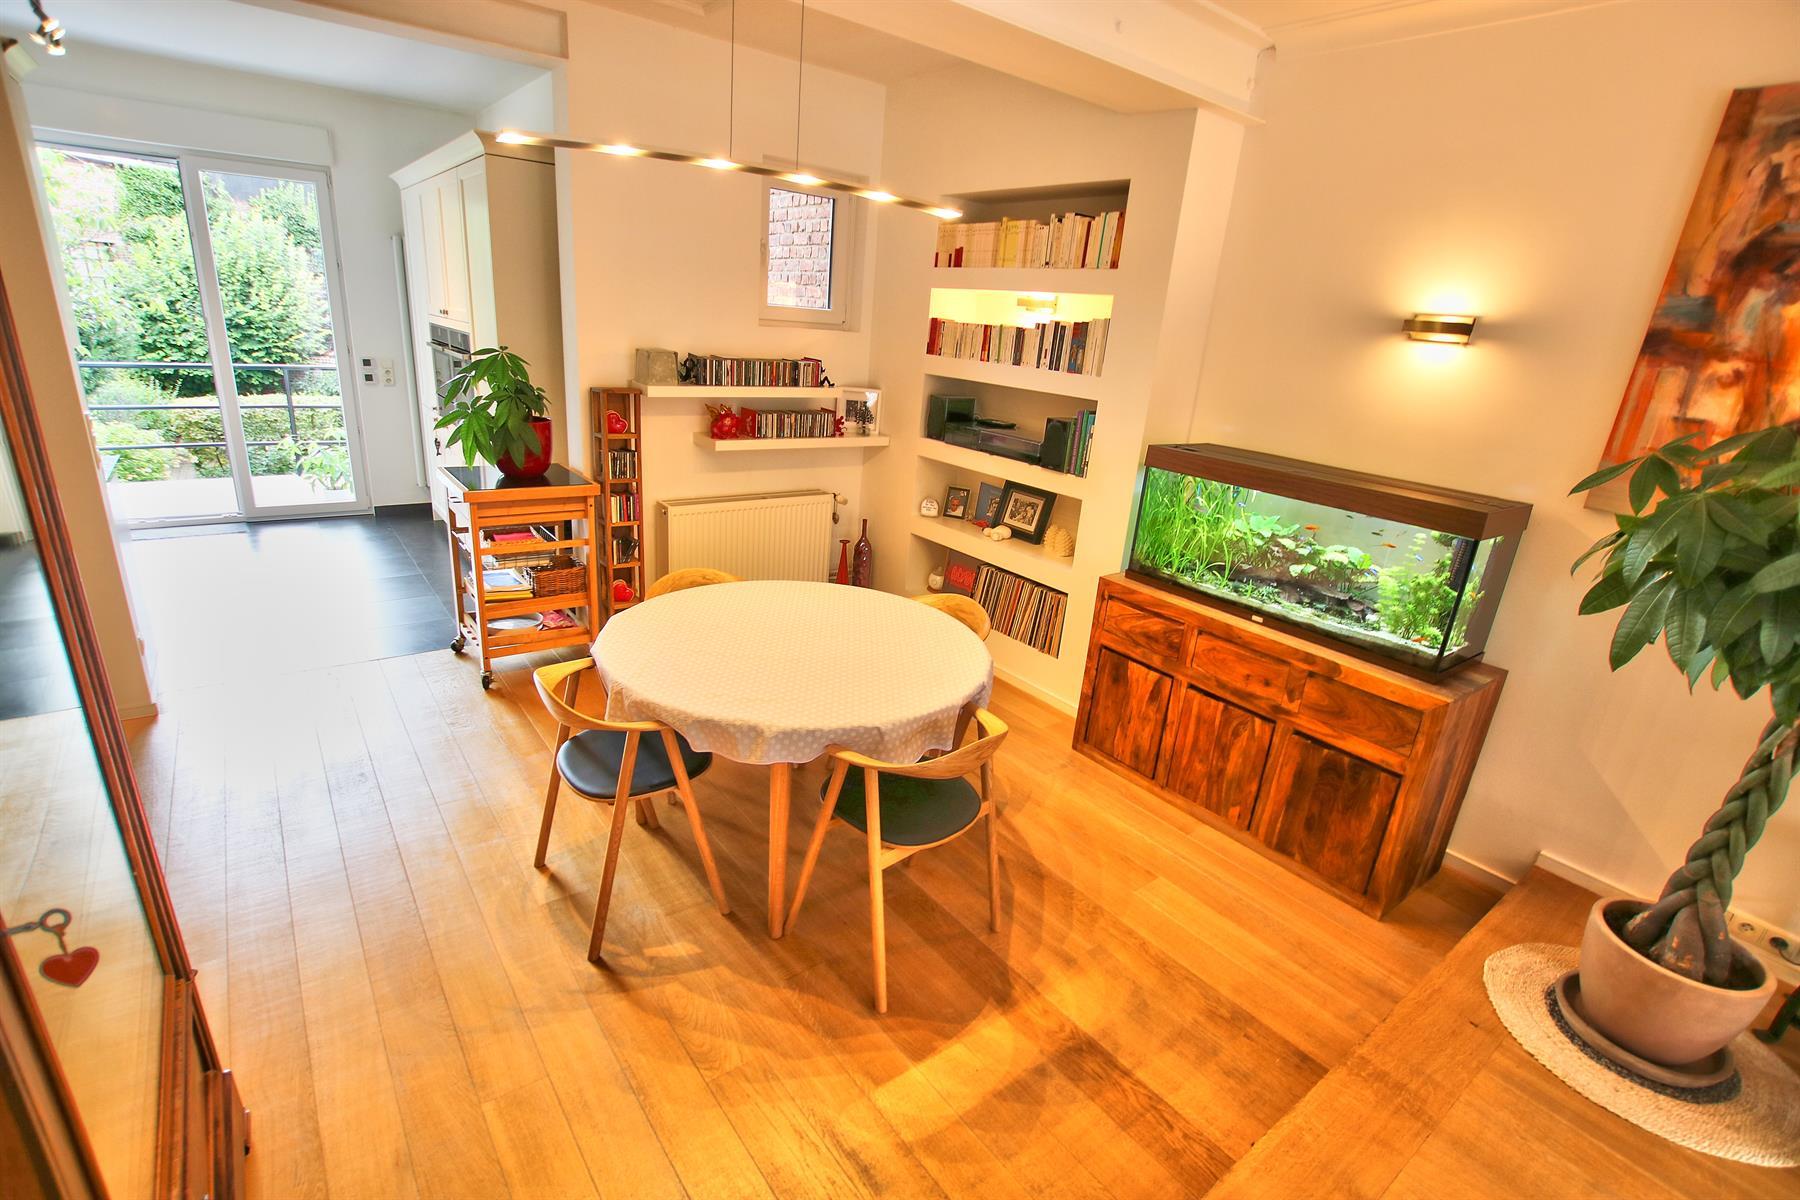 Maison - Etterbeek - #4454540-6